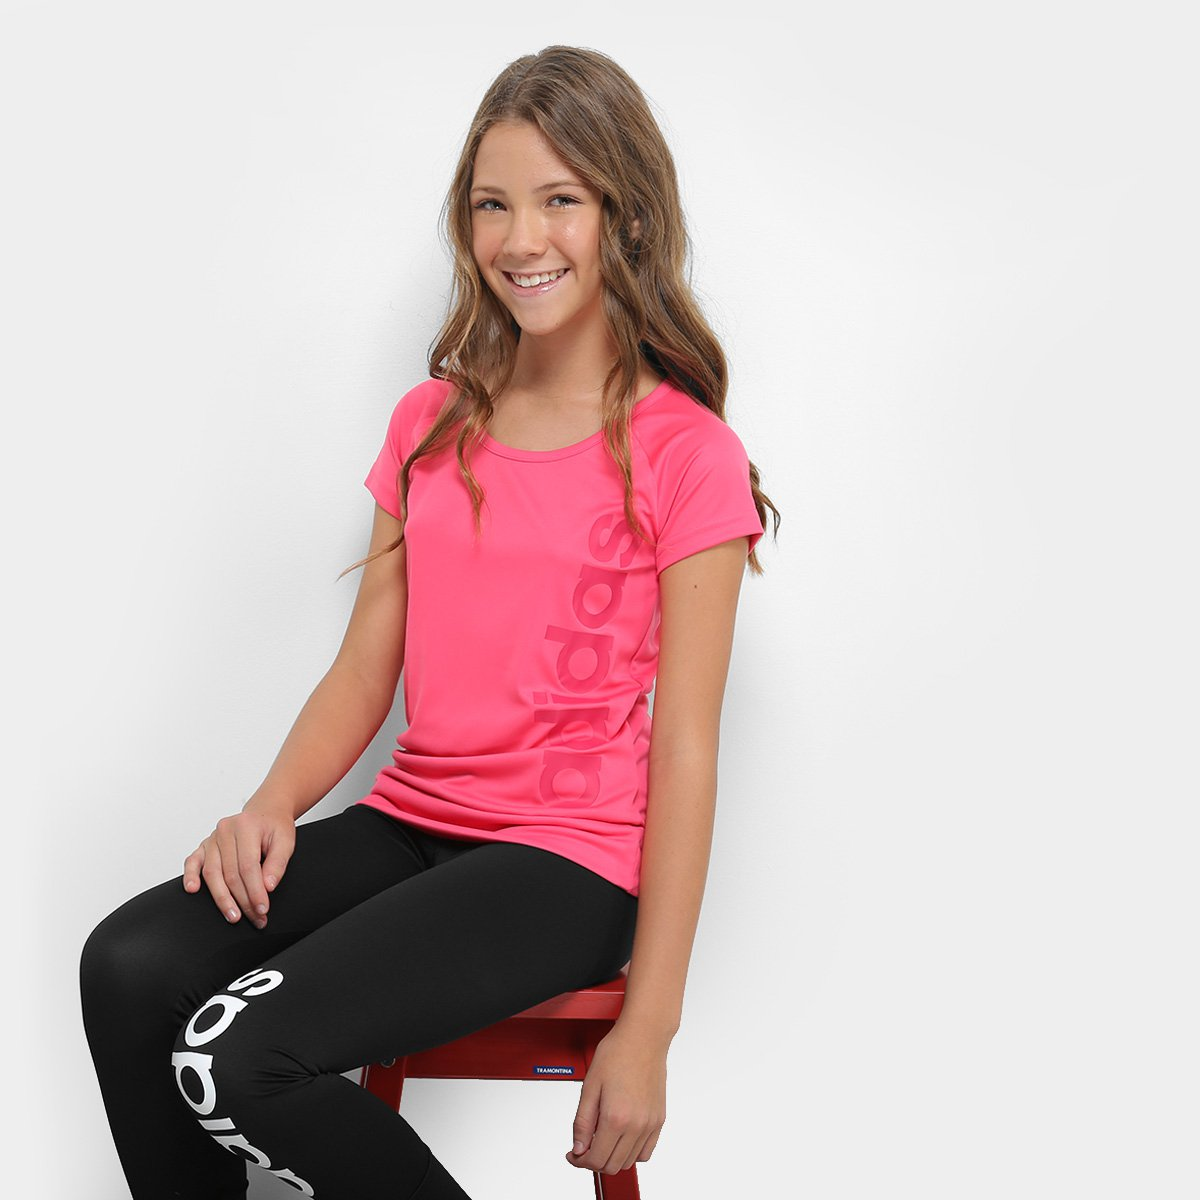 Pink Camiseta Infantil Camiseta Mc Adidas Yg Infantil Gu wgwF7qz